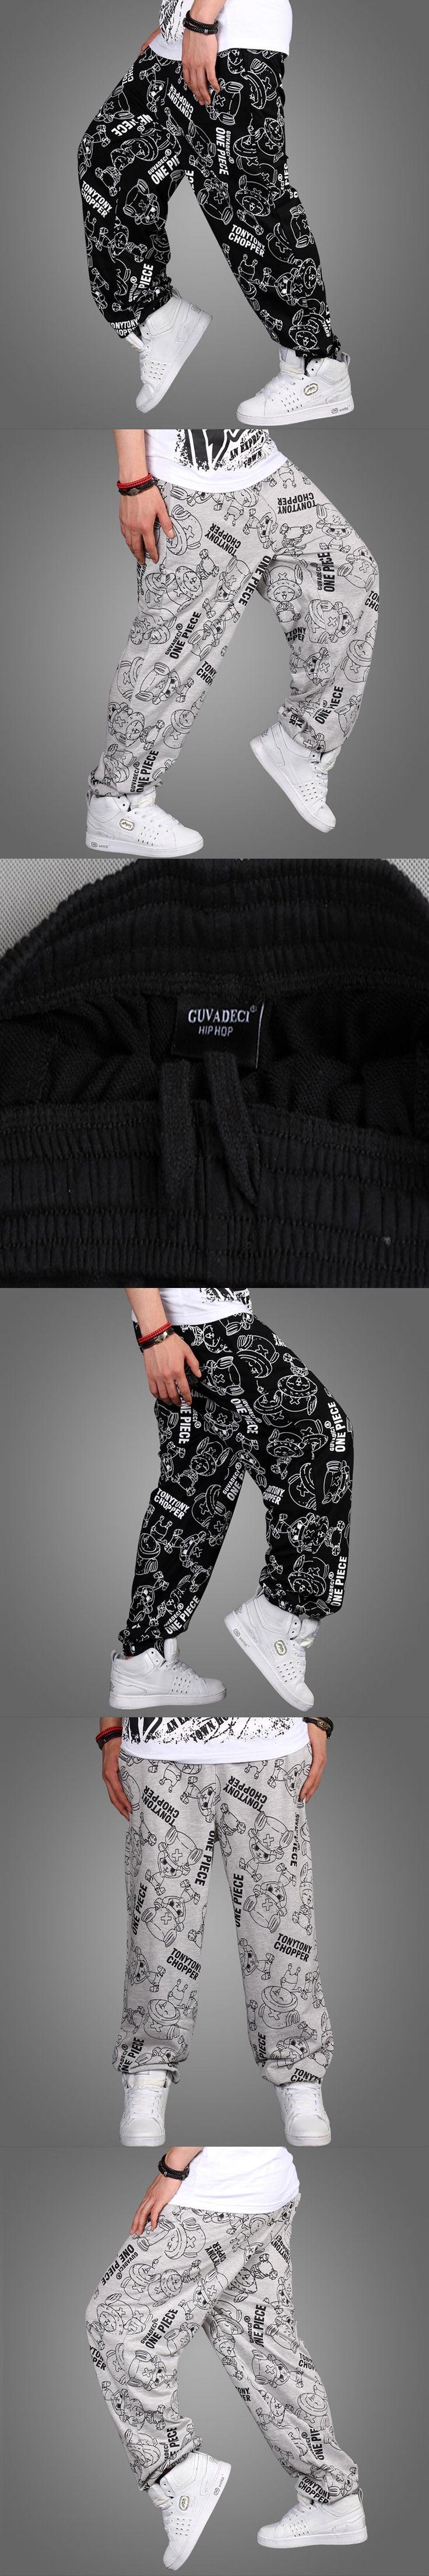 New Fashion Mens Joggers Hip Hop Loose Pants Skateboard Dance Sweatpants Slacks Parkour full length For Mens BOYS PNATS Trousers